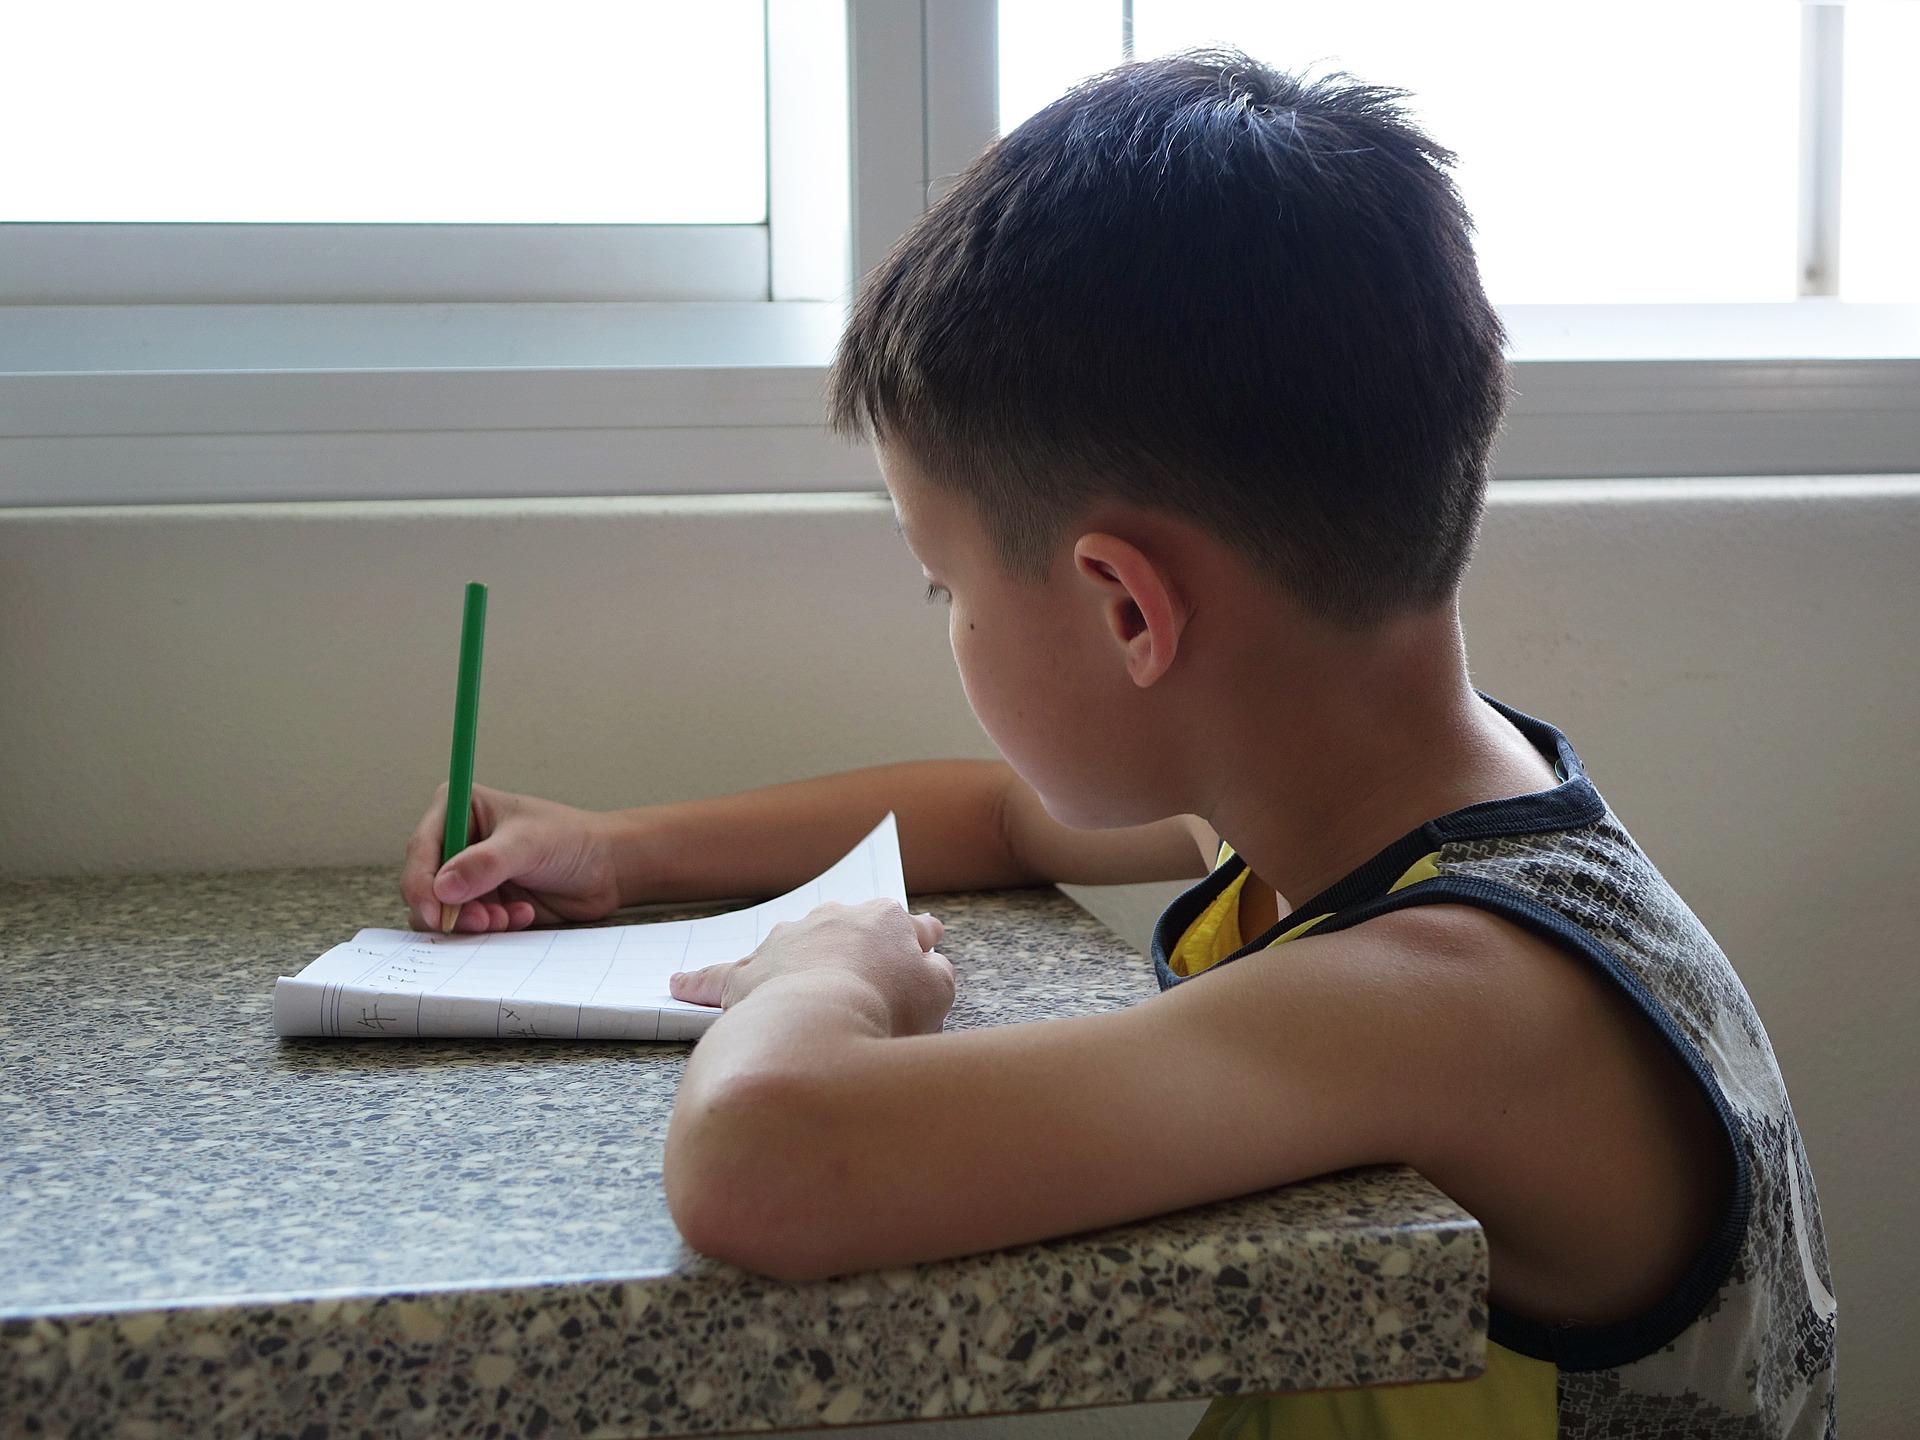 SVR: Children's Essay Contest: Parker Looks Up